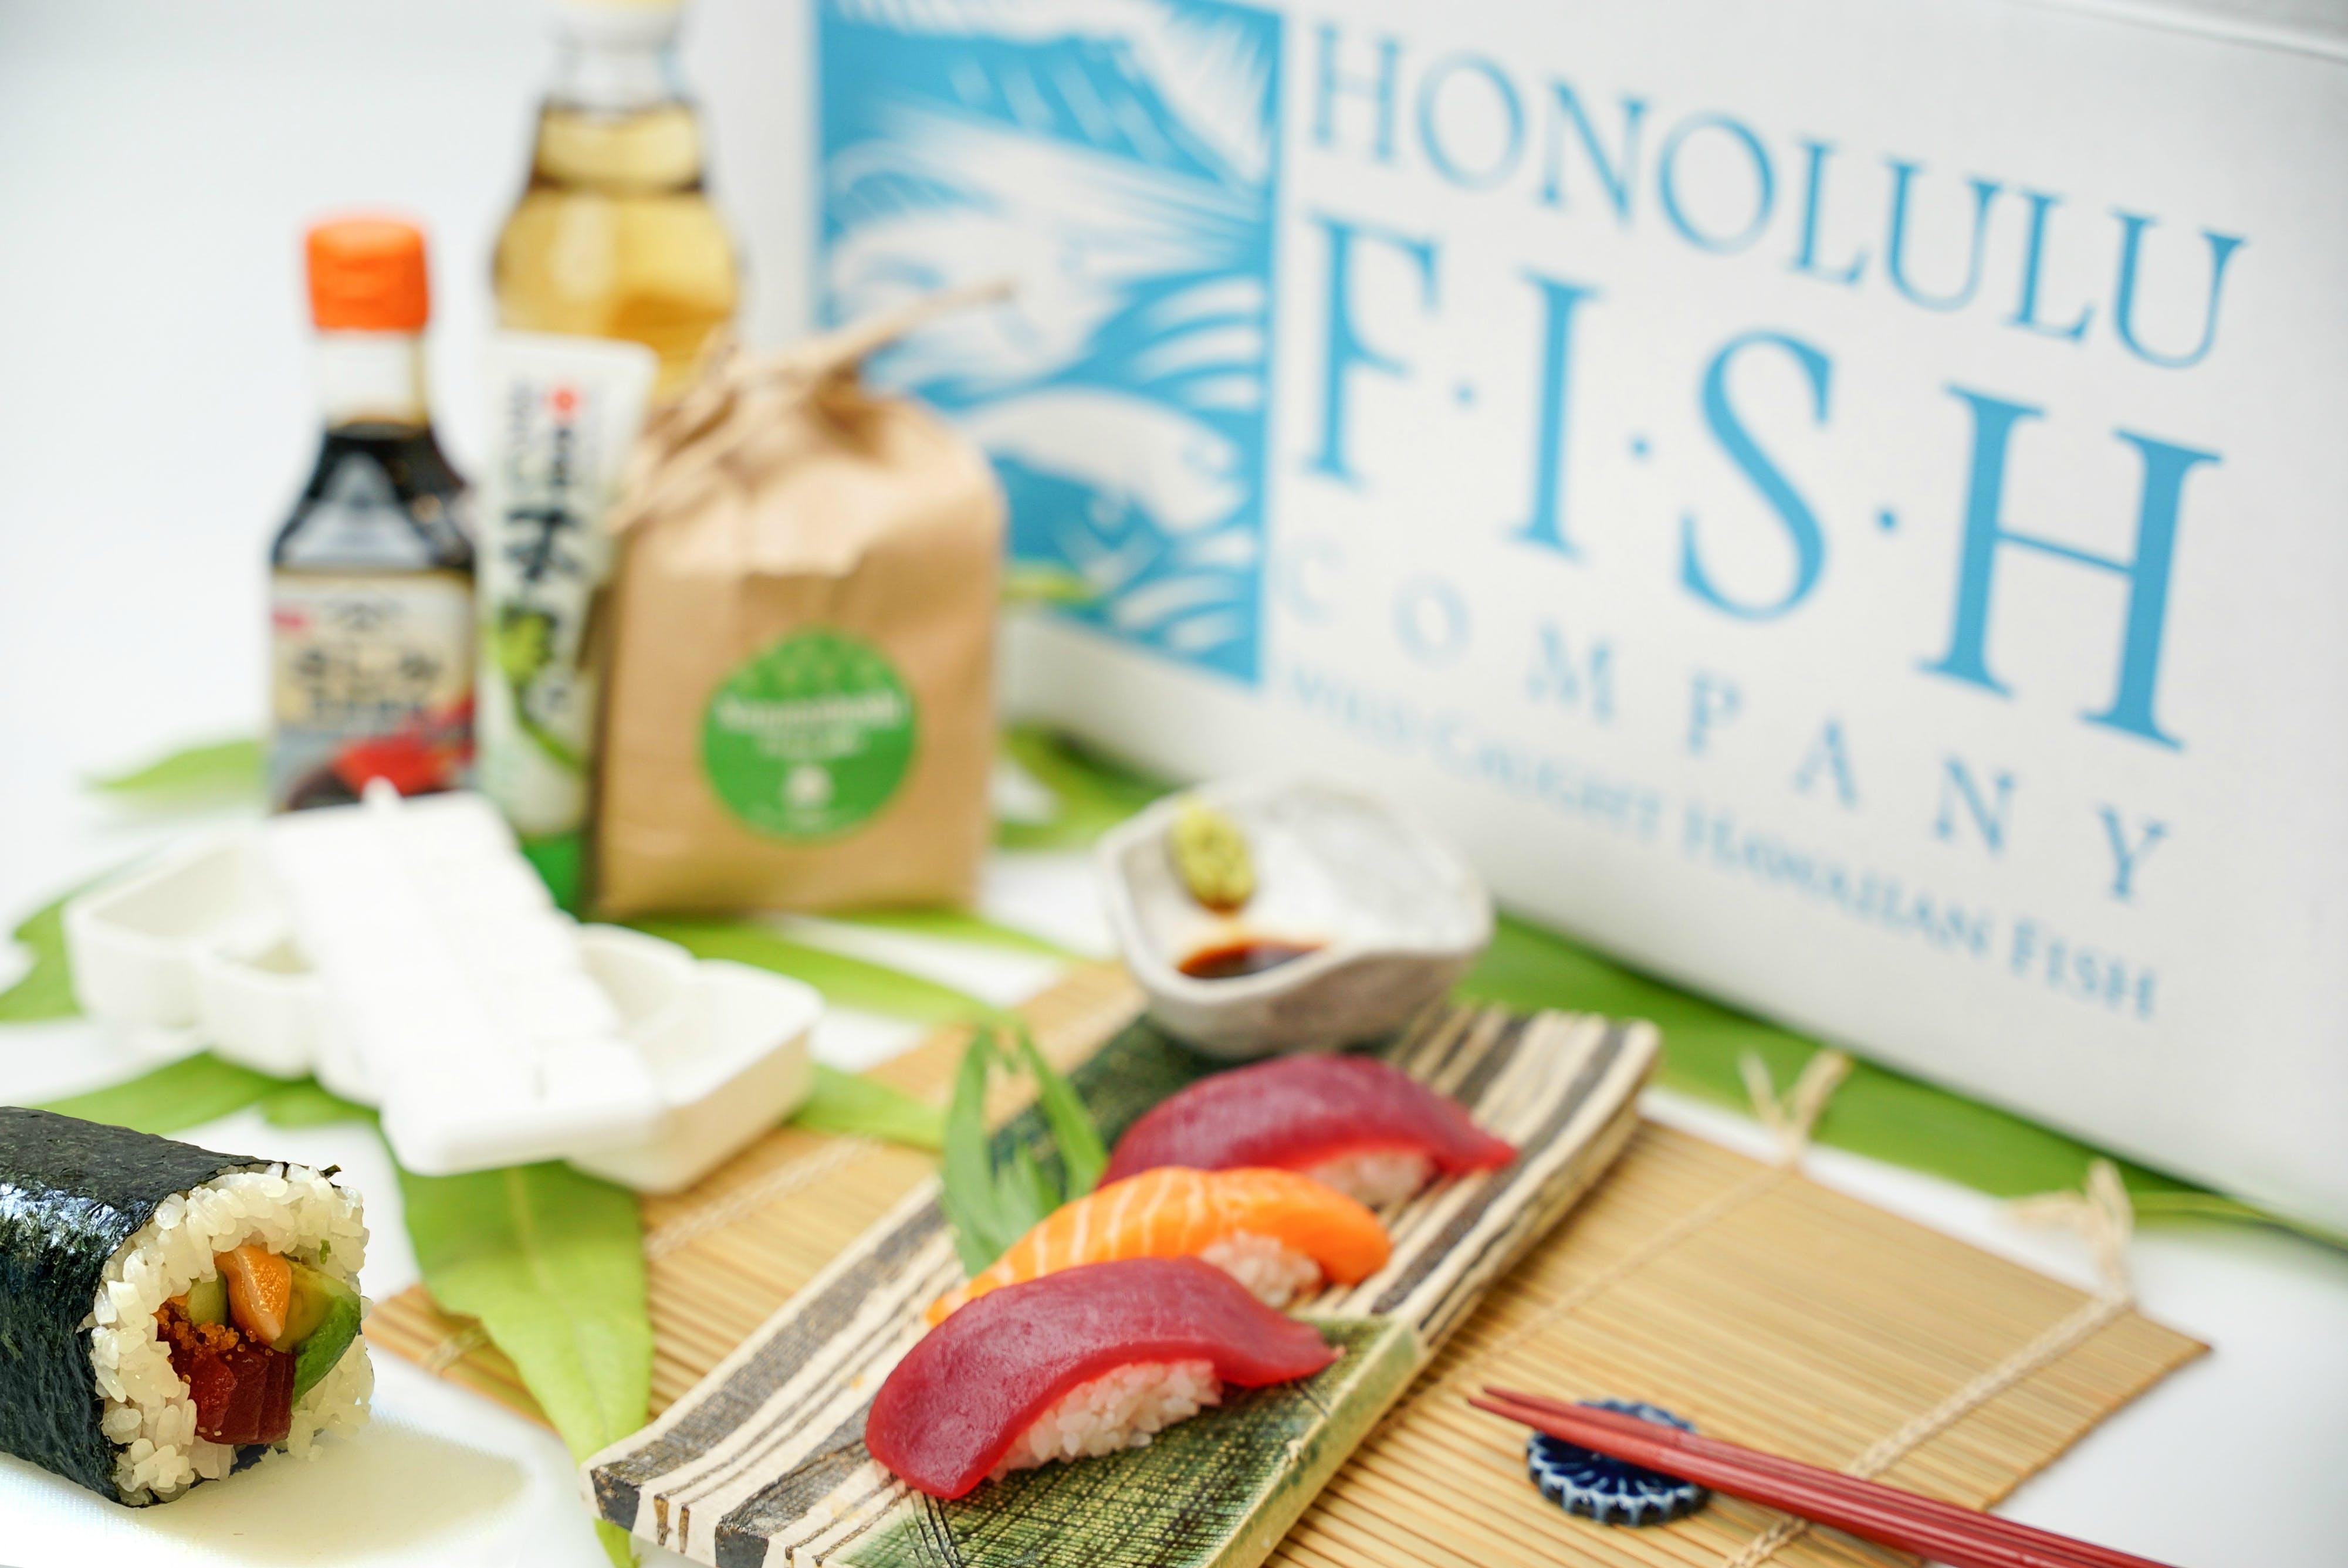 Honolulu Fish Company - Honolulu Fish Co. Nigiri & Maki Roll Home Sushi Kit